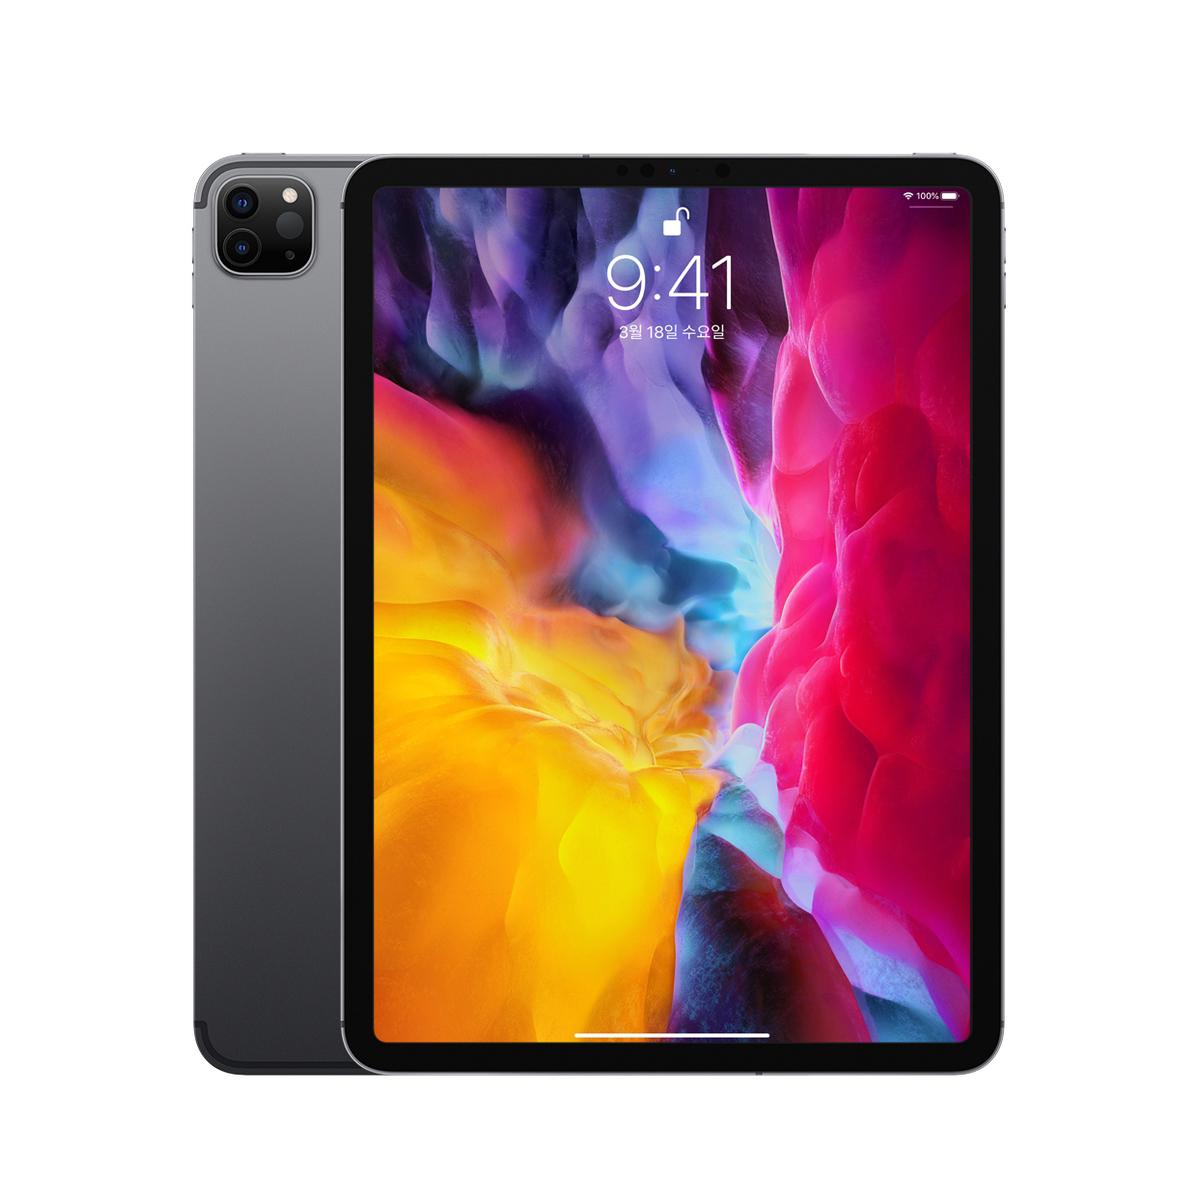 Apple 2020년 iPadPro 11 2세대, Wi-Fi+Cellular, 128GB, Space Gray